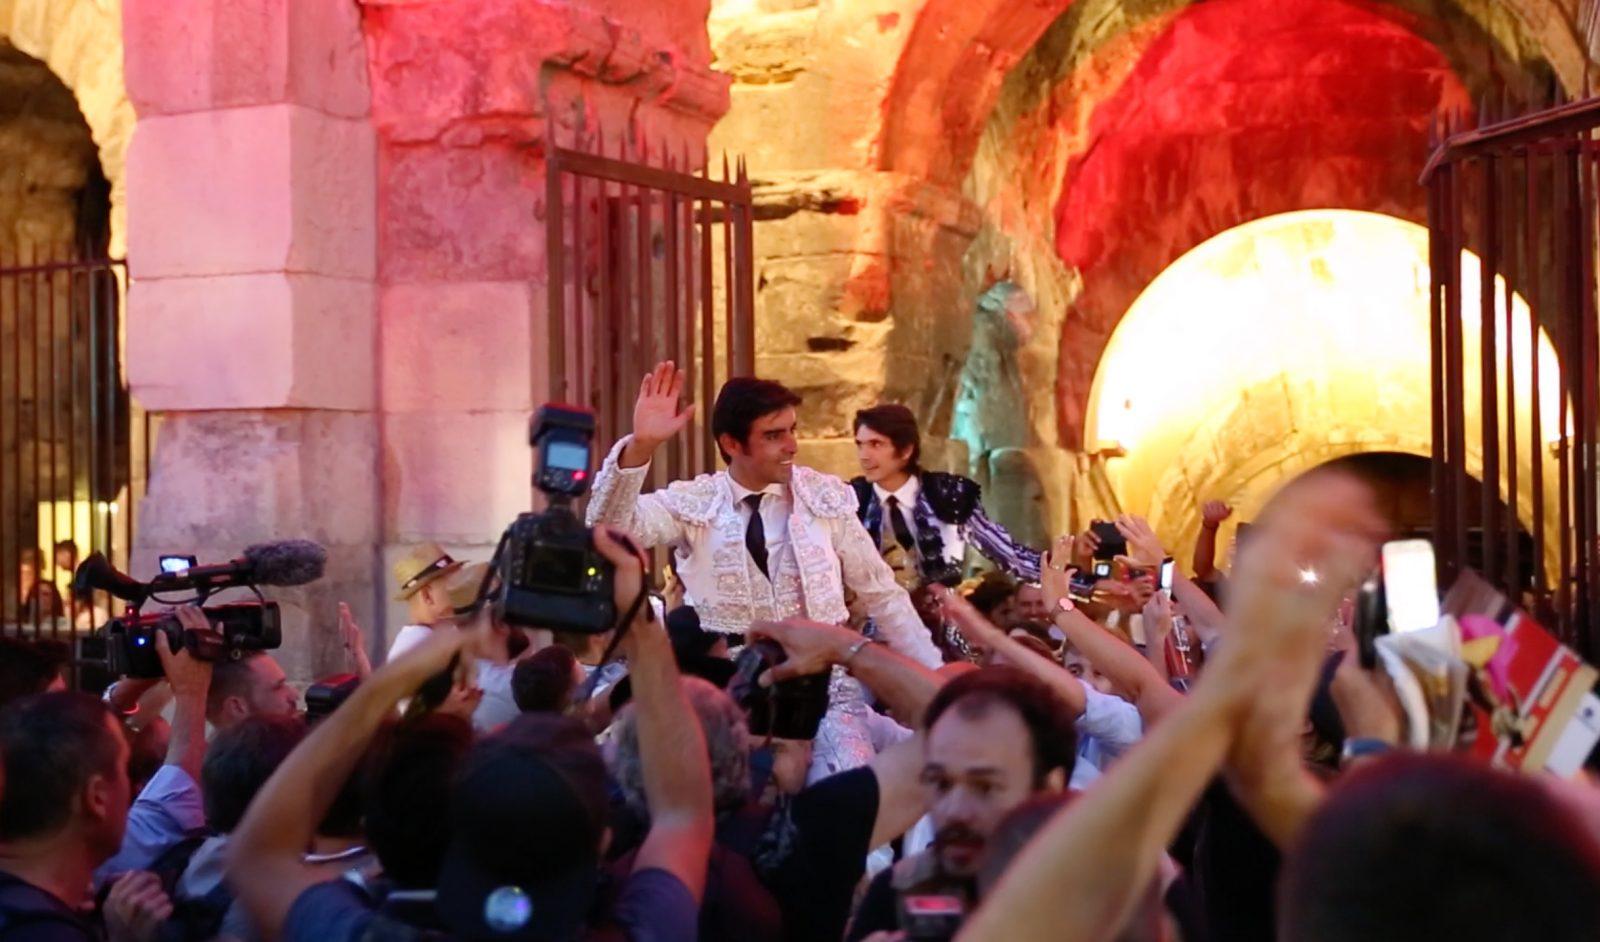 BILAN DE LA FERIA DES VENDANGES, Partie 2 // Toreros en verve, palcos en berne…